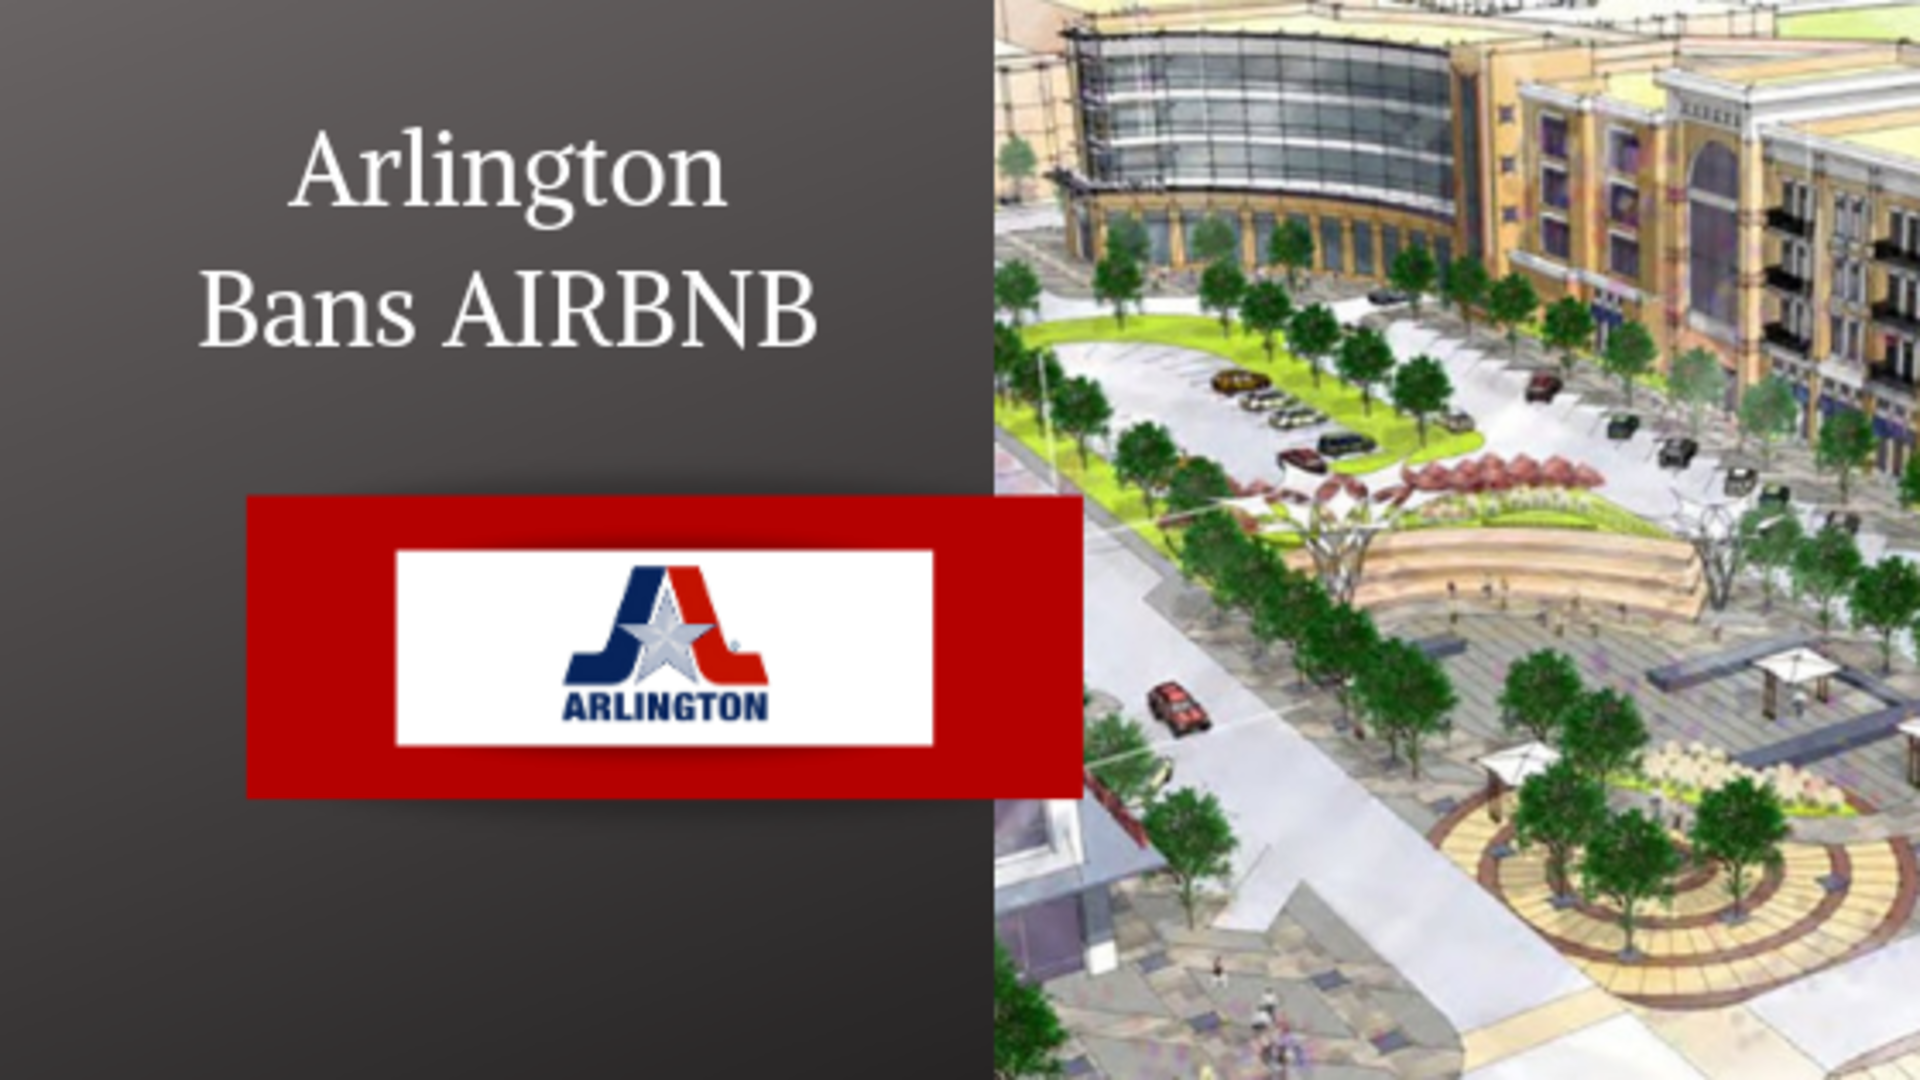 Arlington Votes To Ban AirBnb